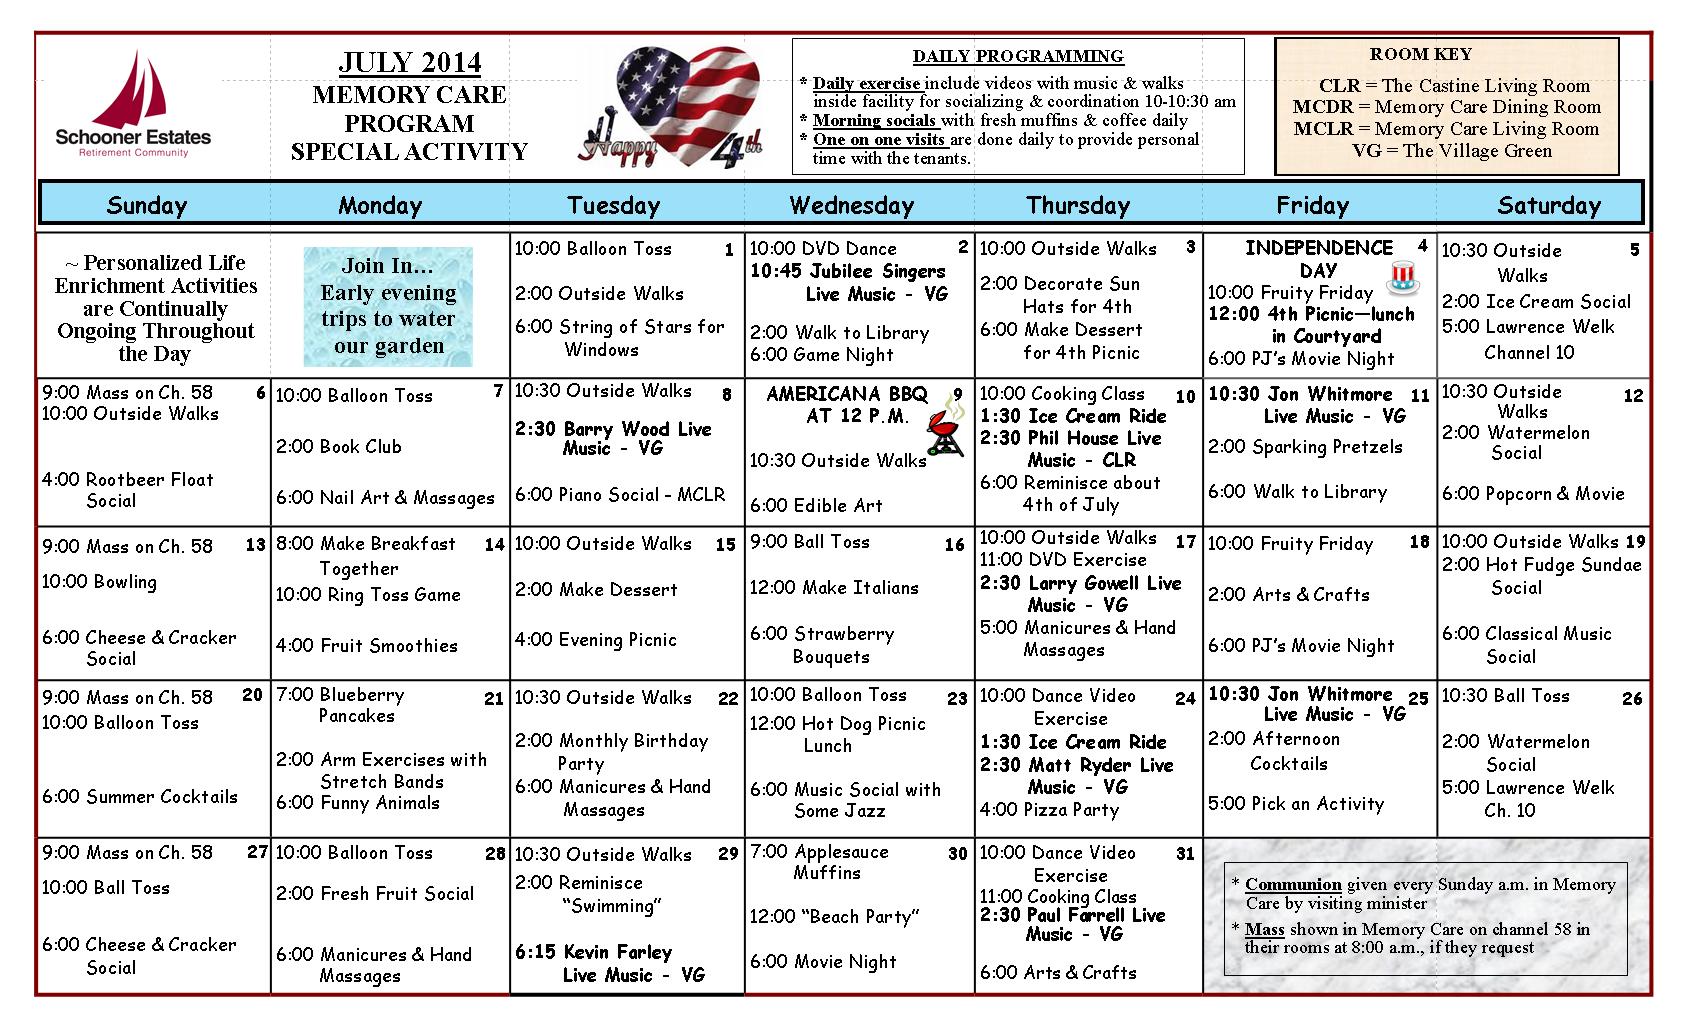 Memory Care July 2014 Calendar